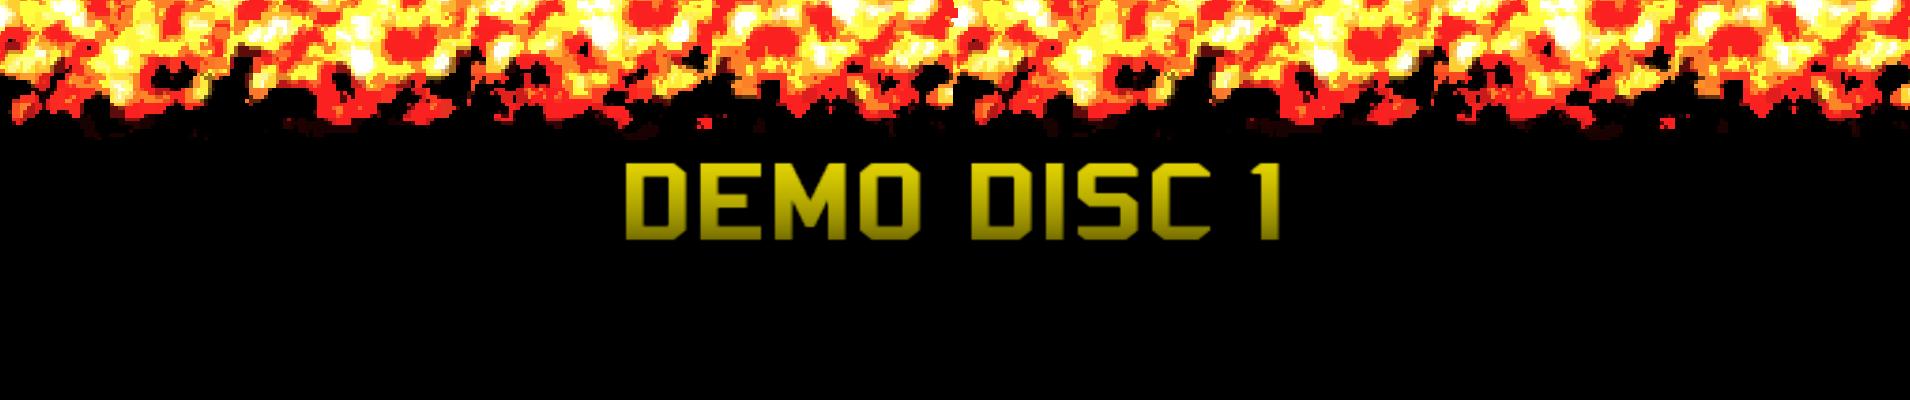 Demo Disc 1